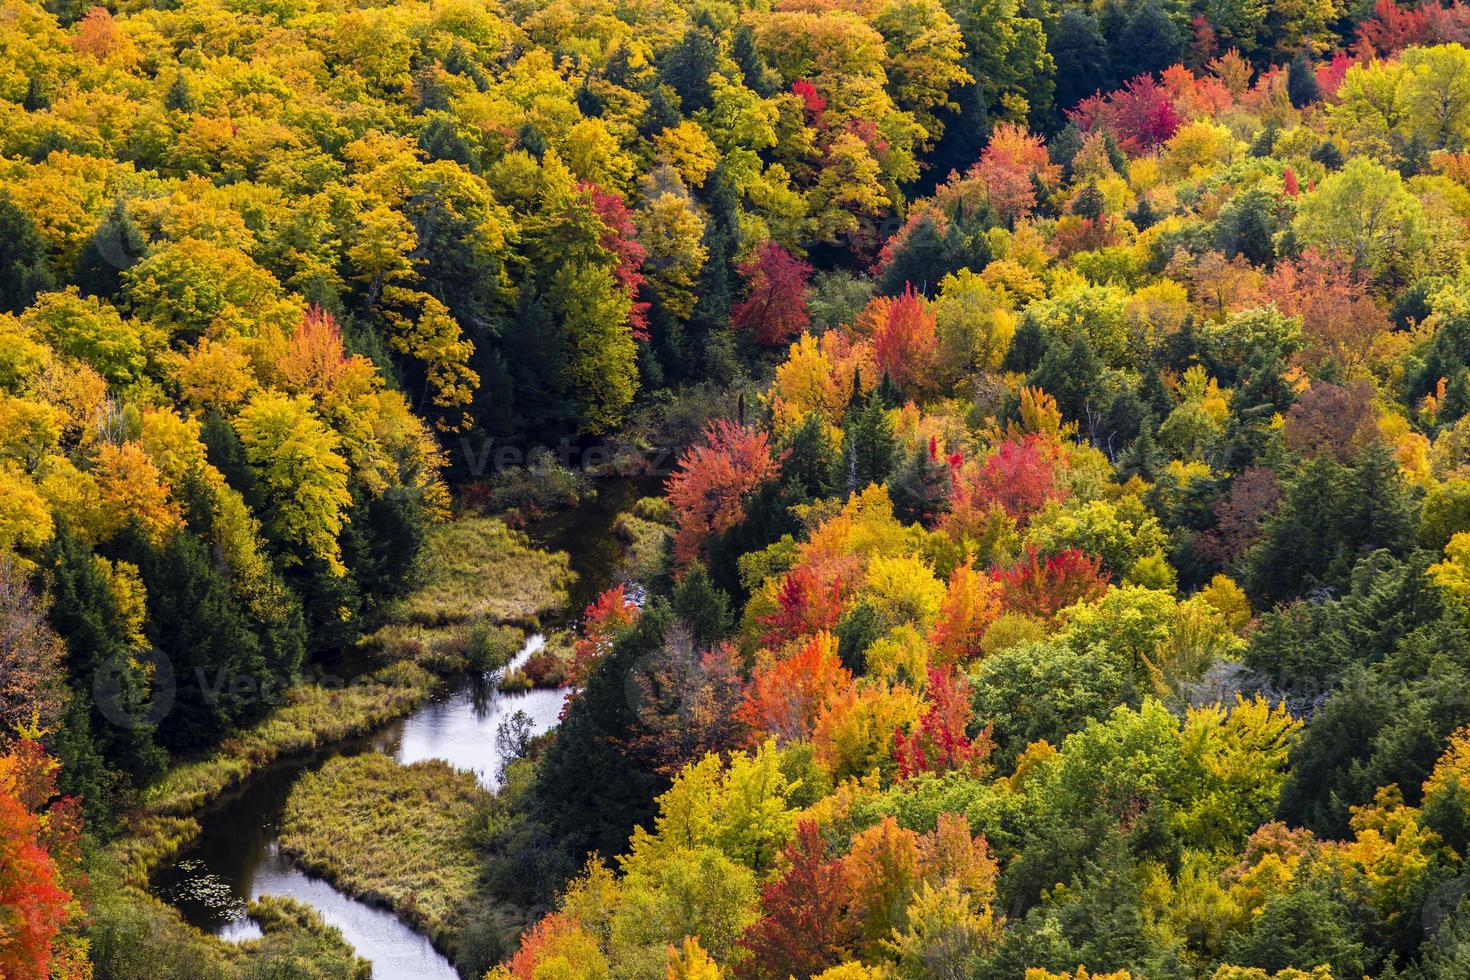 Falls colors at Carp river, Porcupine Mountains State Park photo